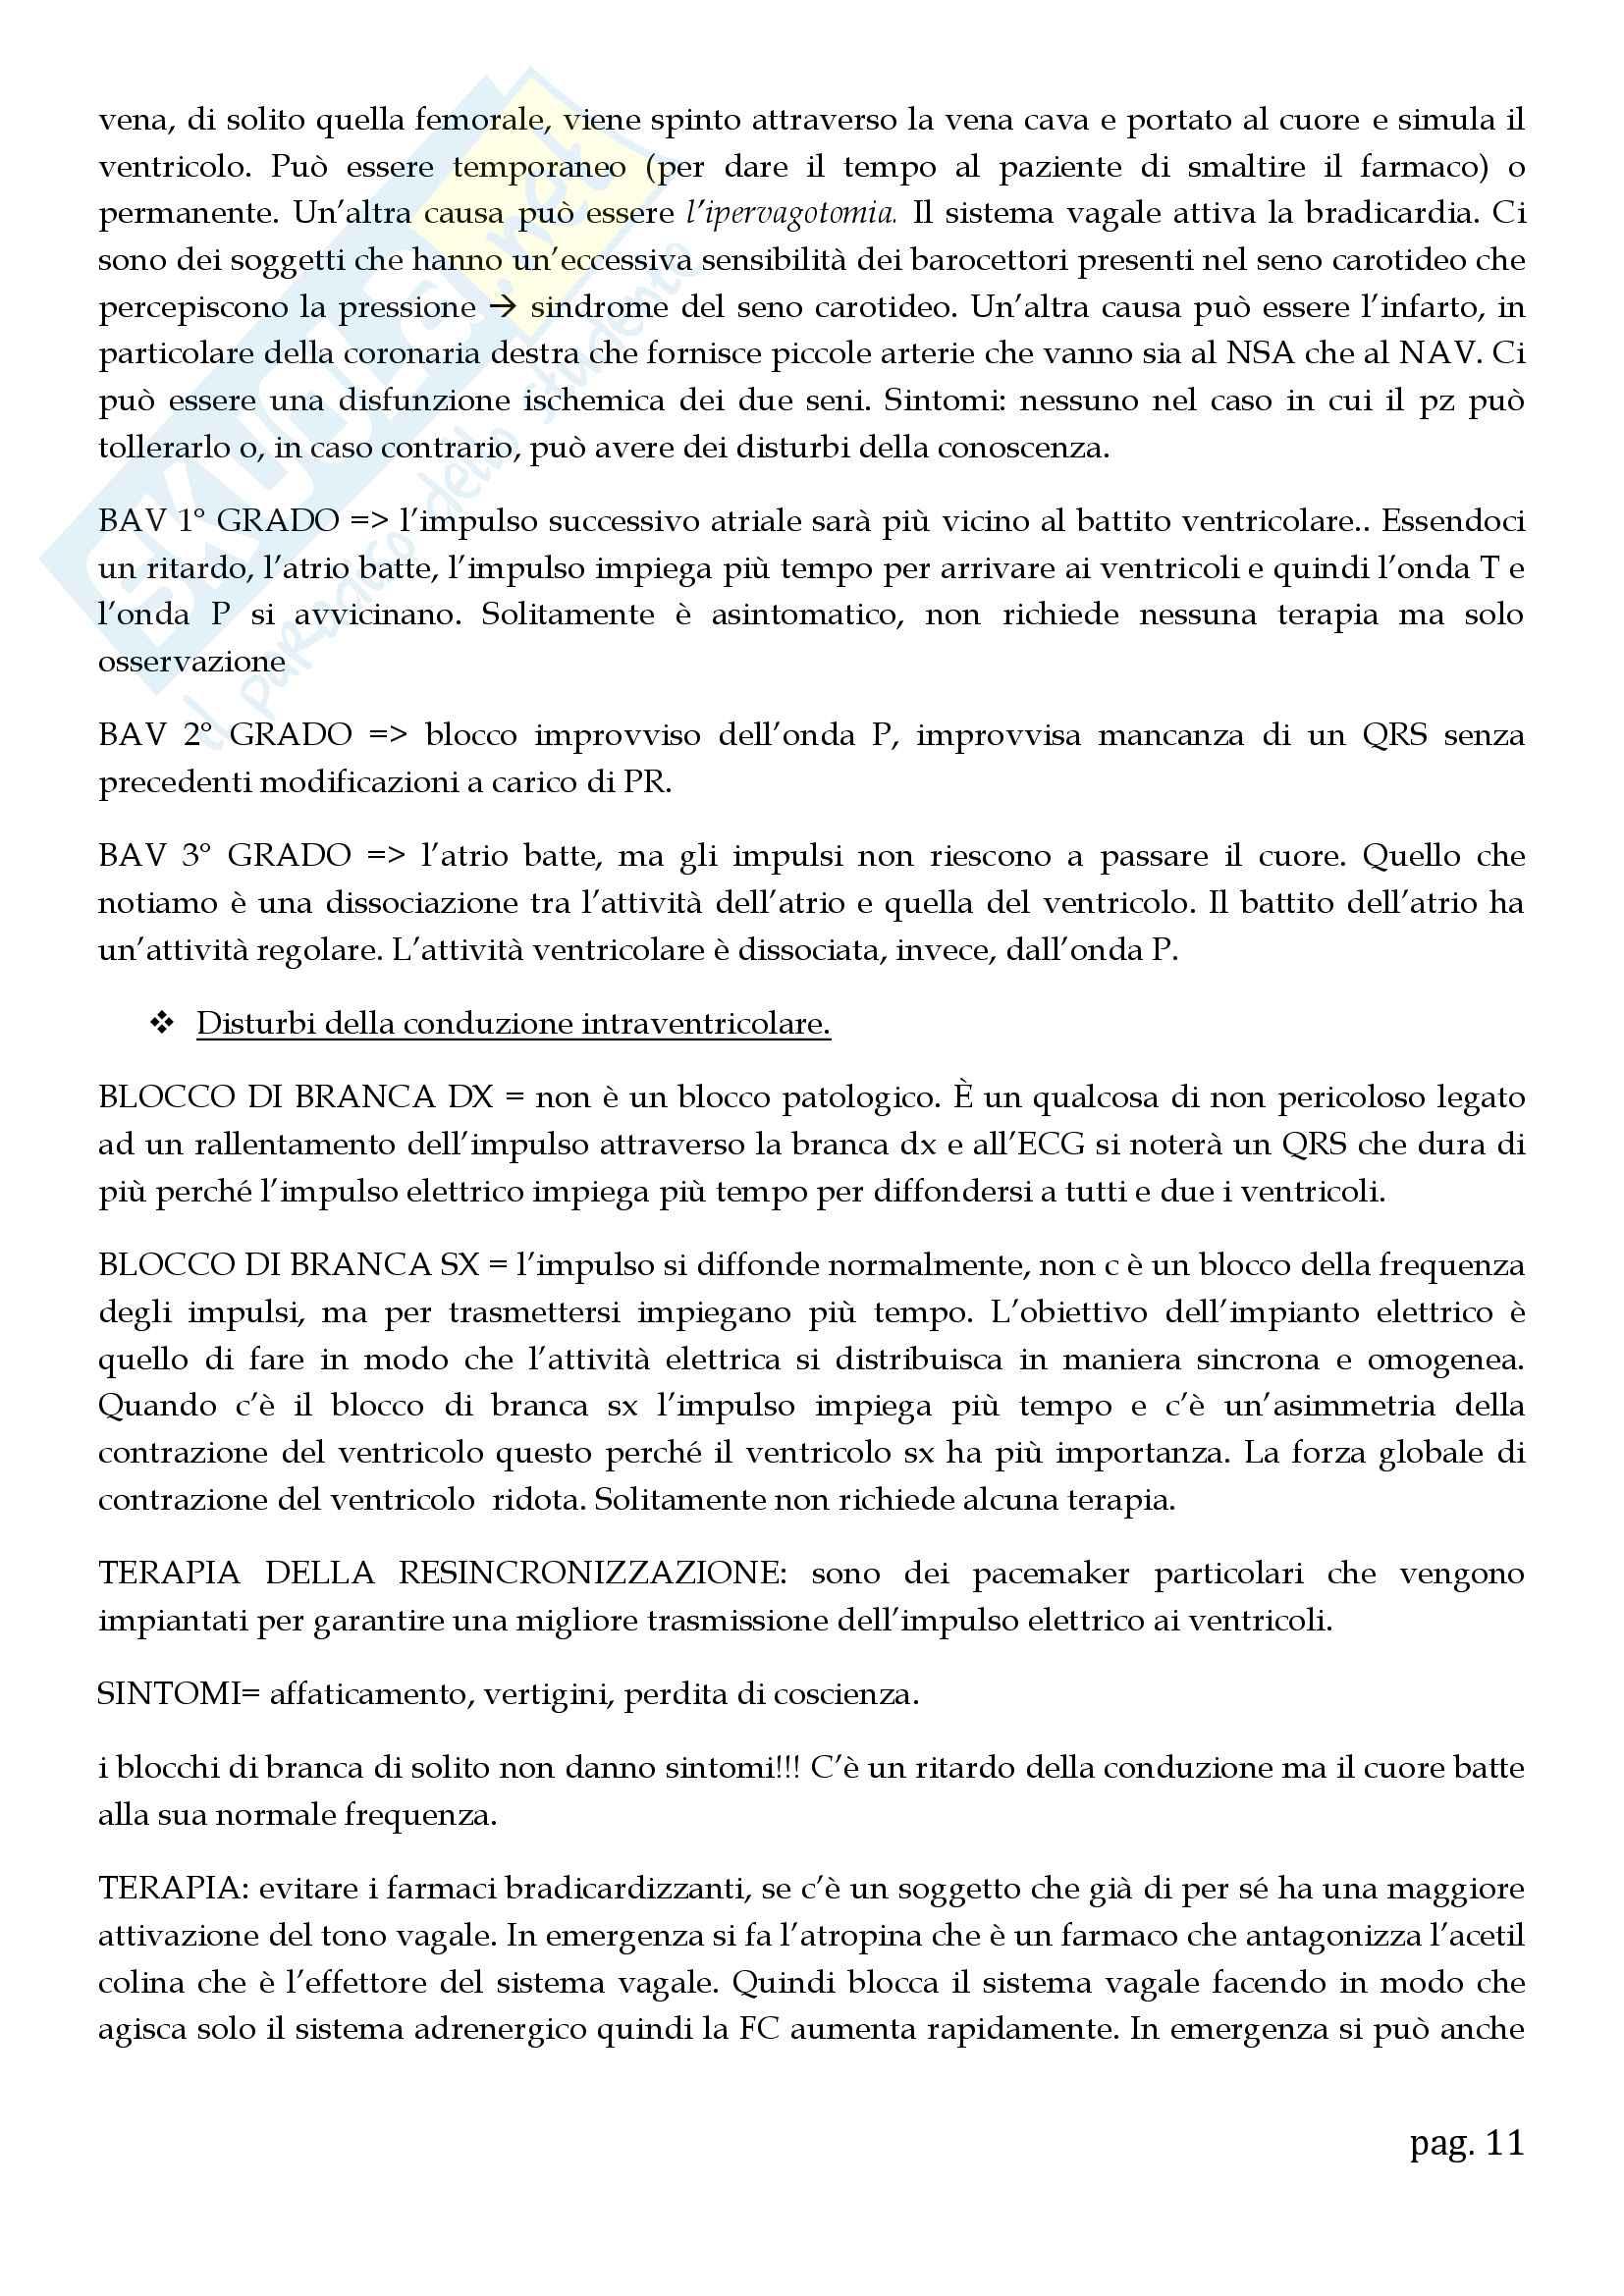 Cardiologia - appunti Pag. 11